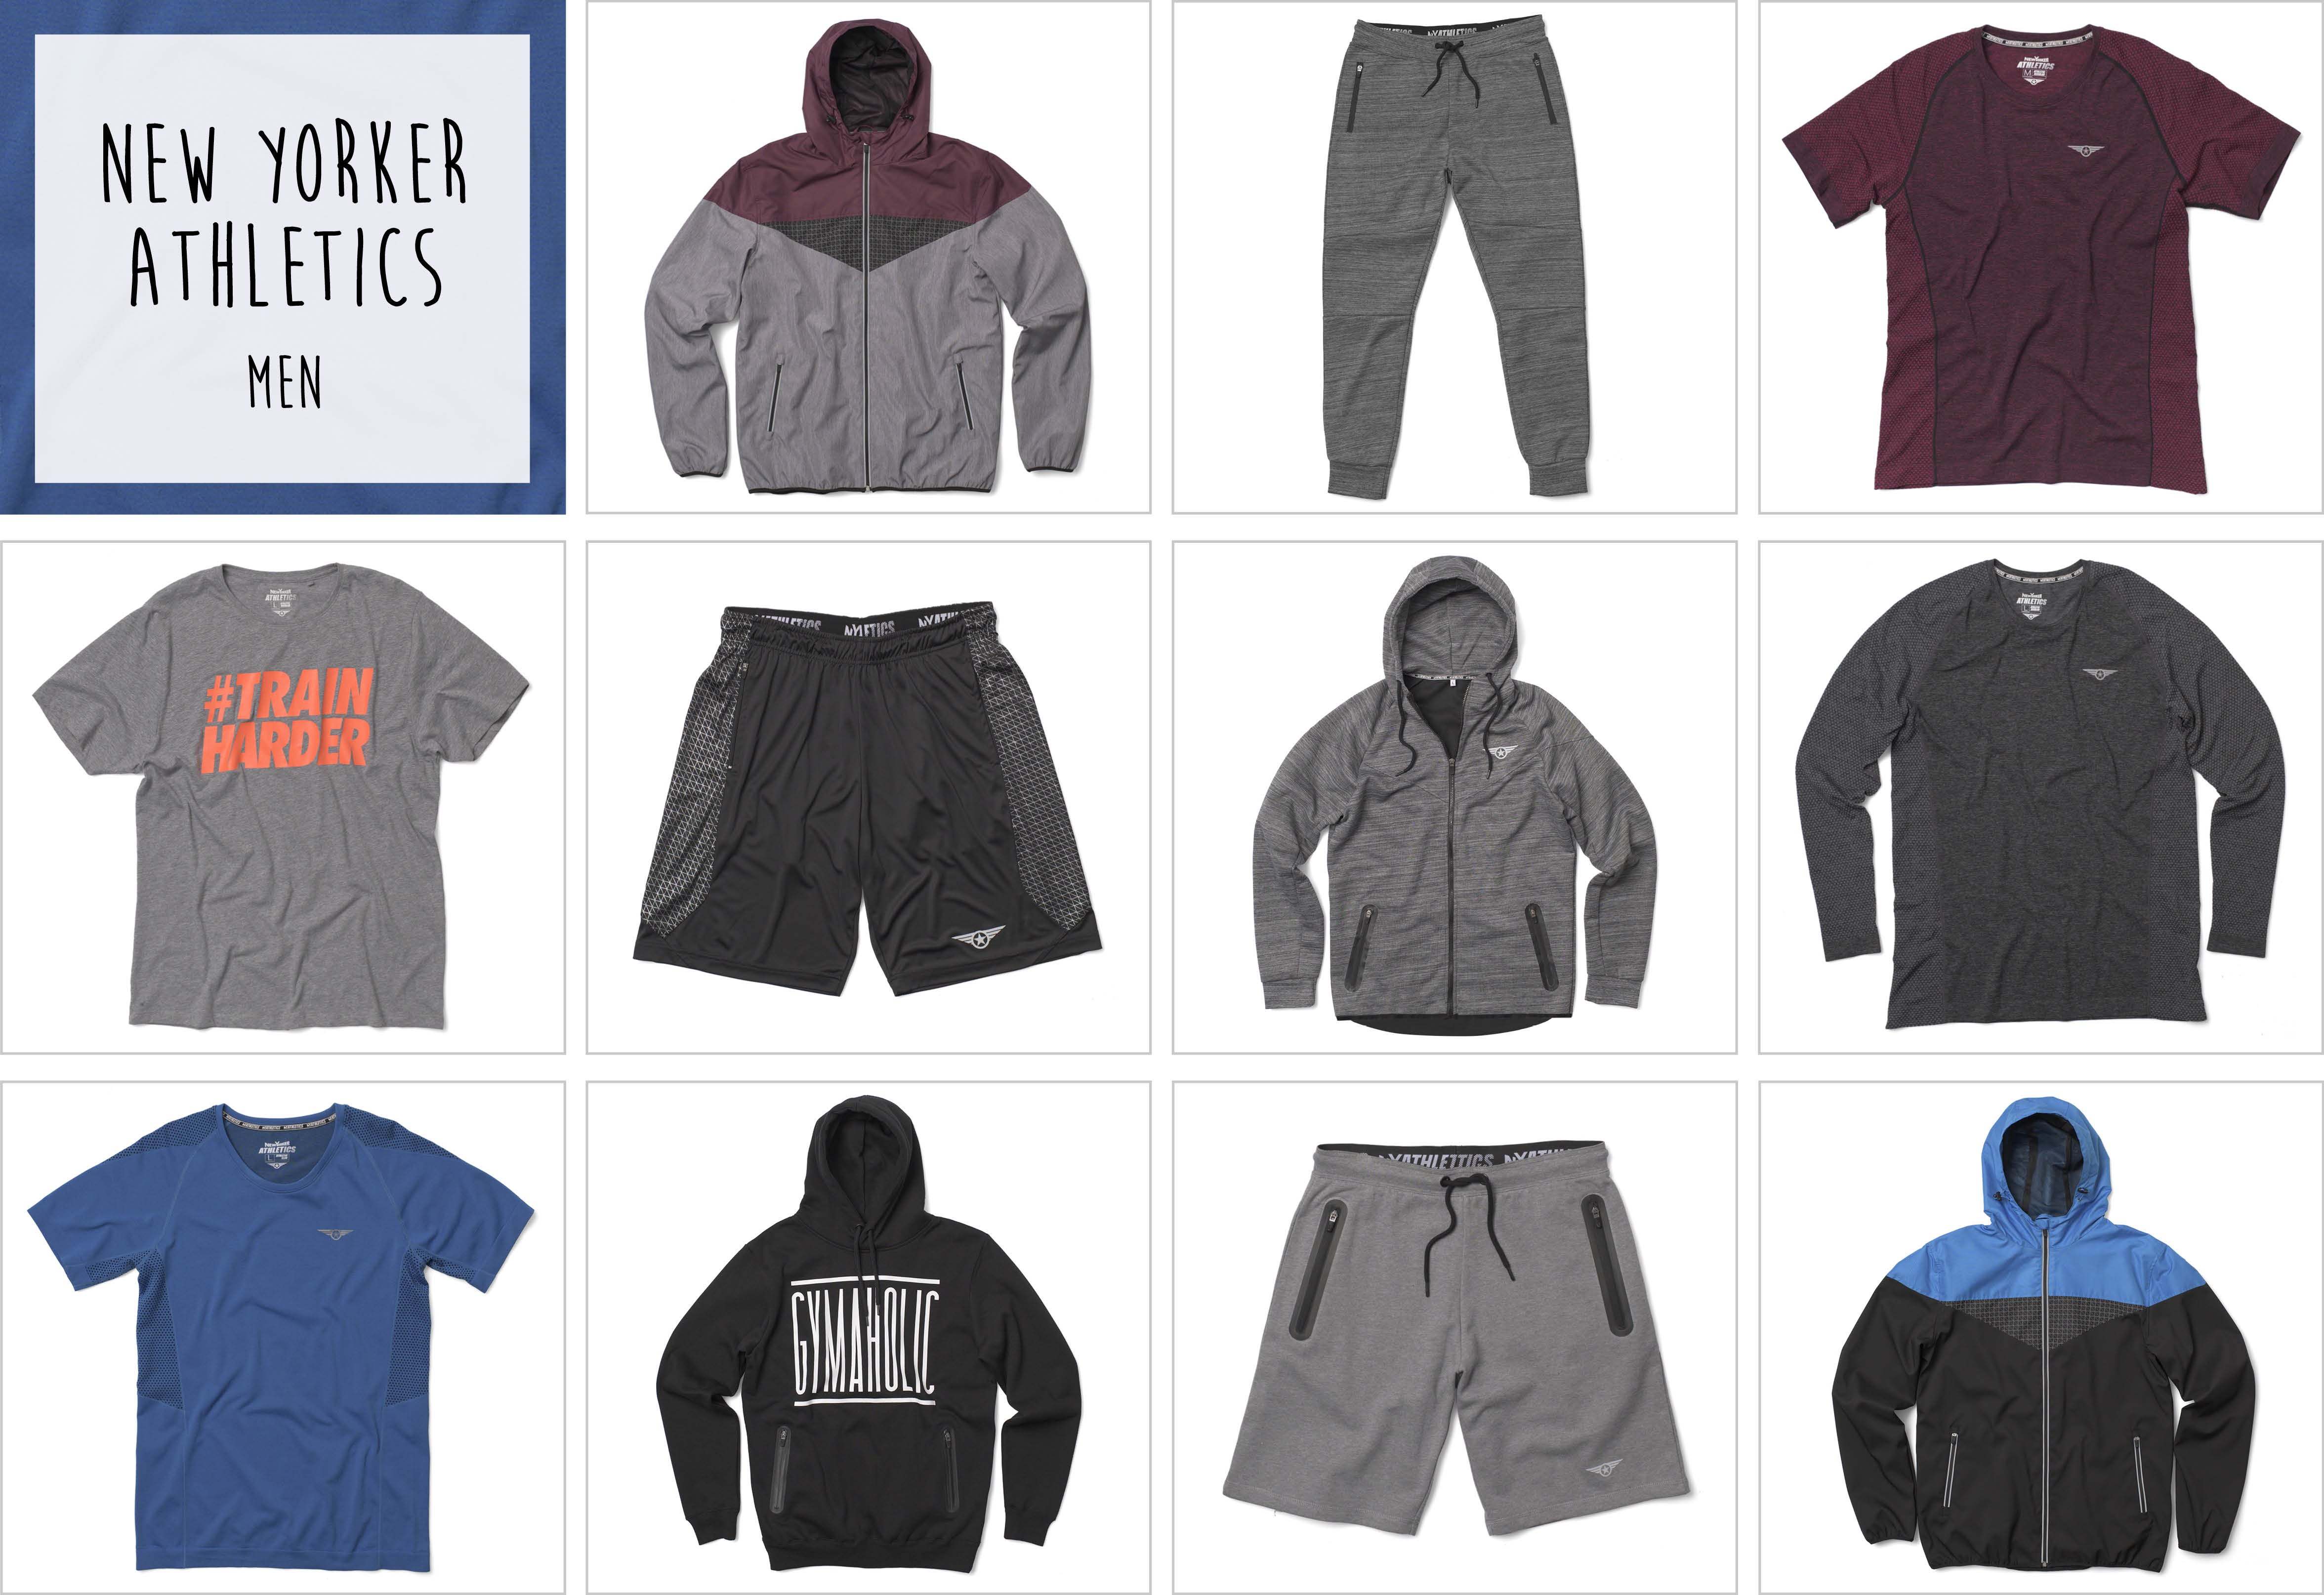 New Yorker Одежда Интернет Магазин